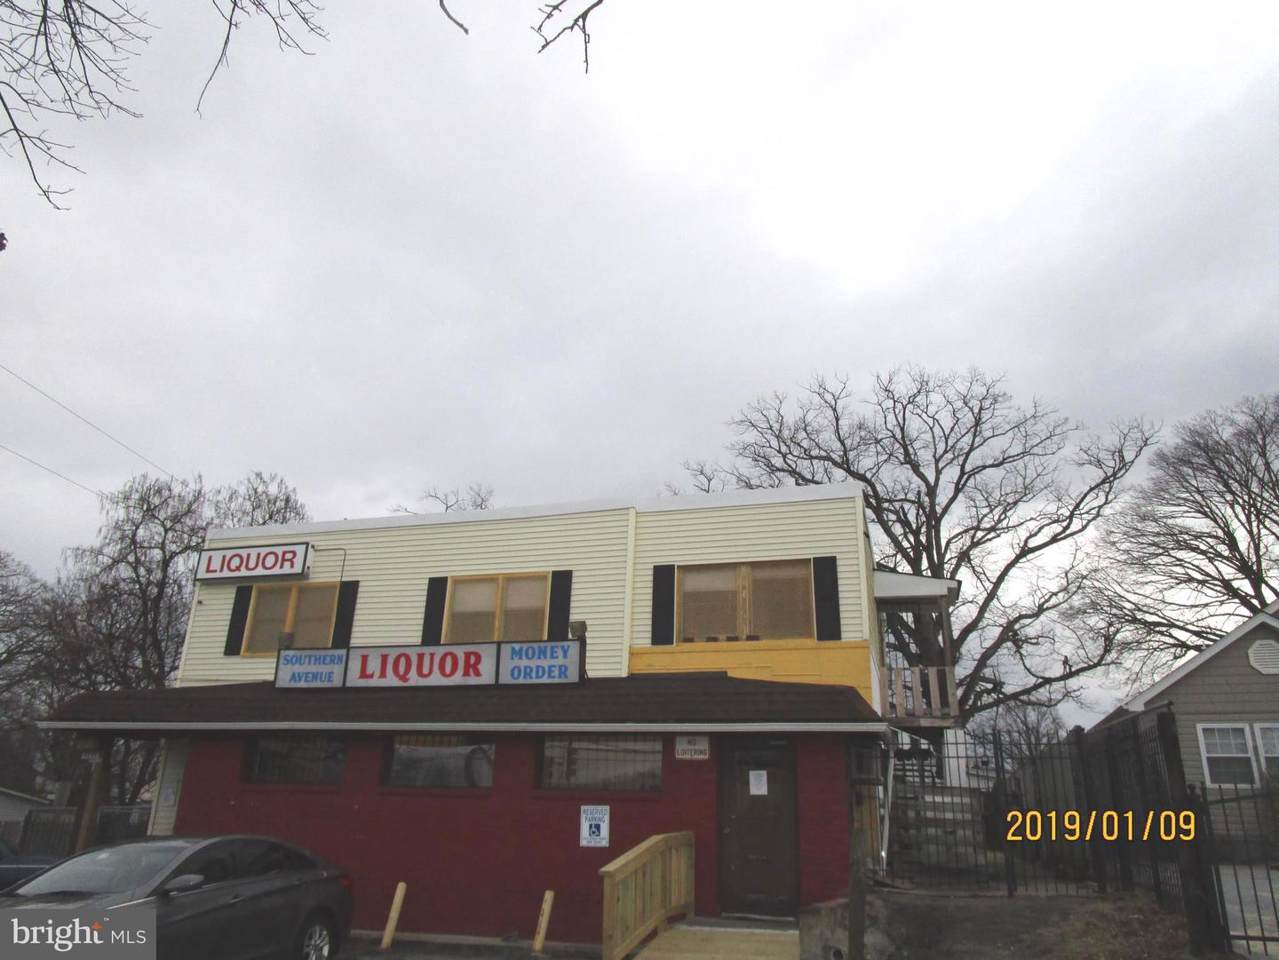 4259 Southern Avenue - Photo 1